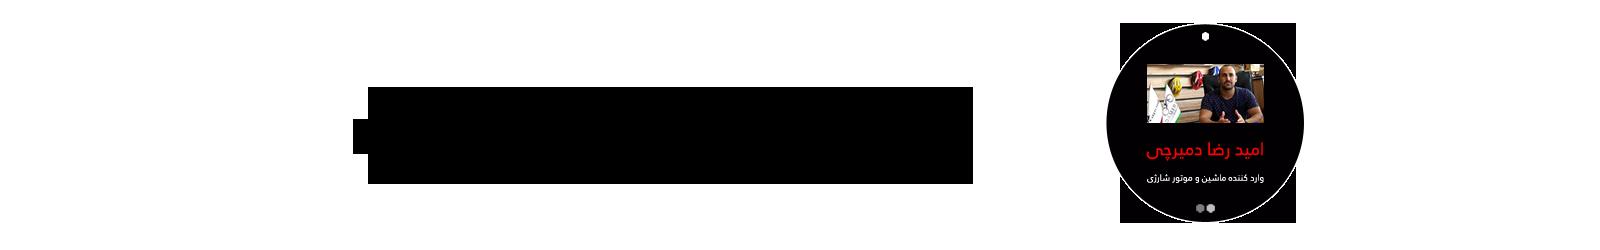 دمیرچی